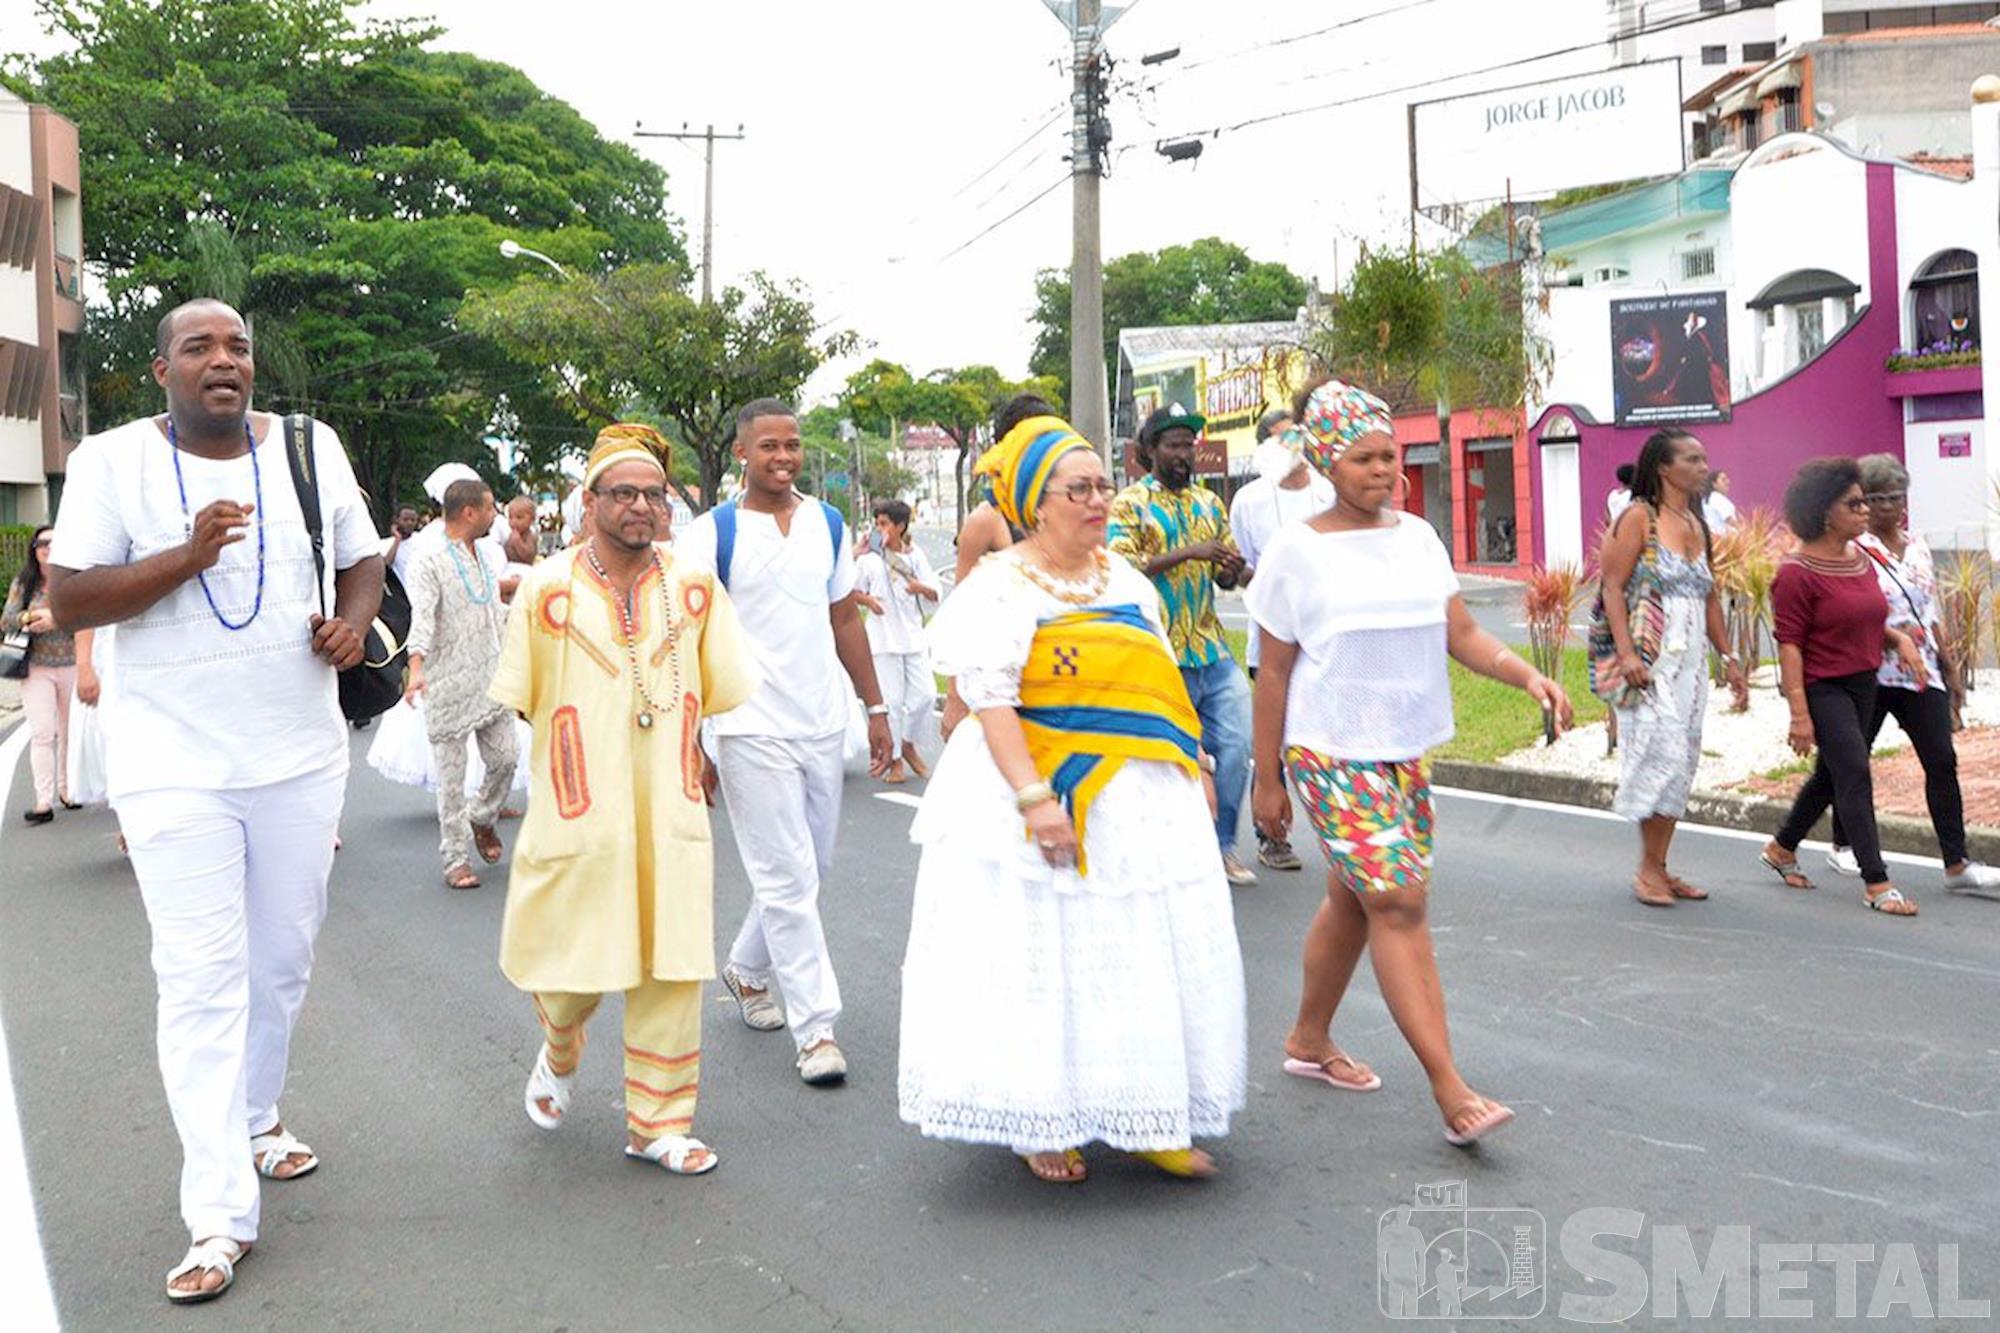 1ª Marcha Zumbi & Dandara em Sorocaba, marcha,  negro,  zumbi,  dandara, Foguinho/Imprensa SMetal, Marcha Zumbi & Dandara marca o Dia da Consciência Negra em Sorocaba